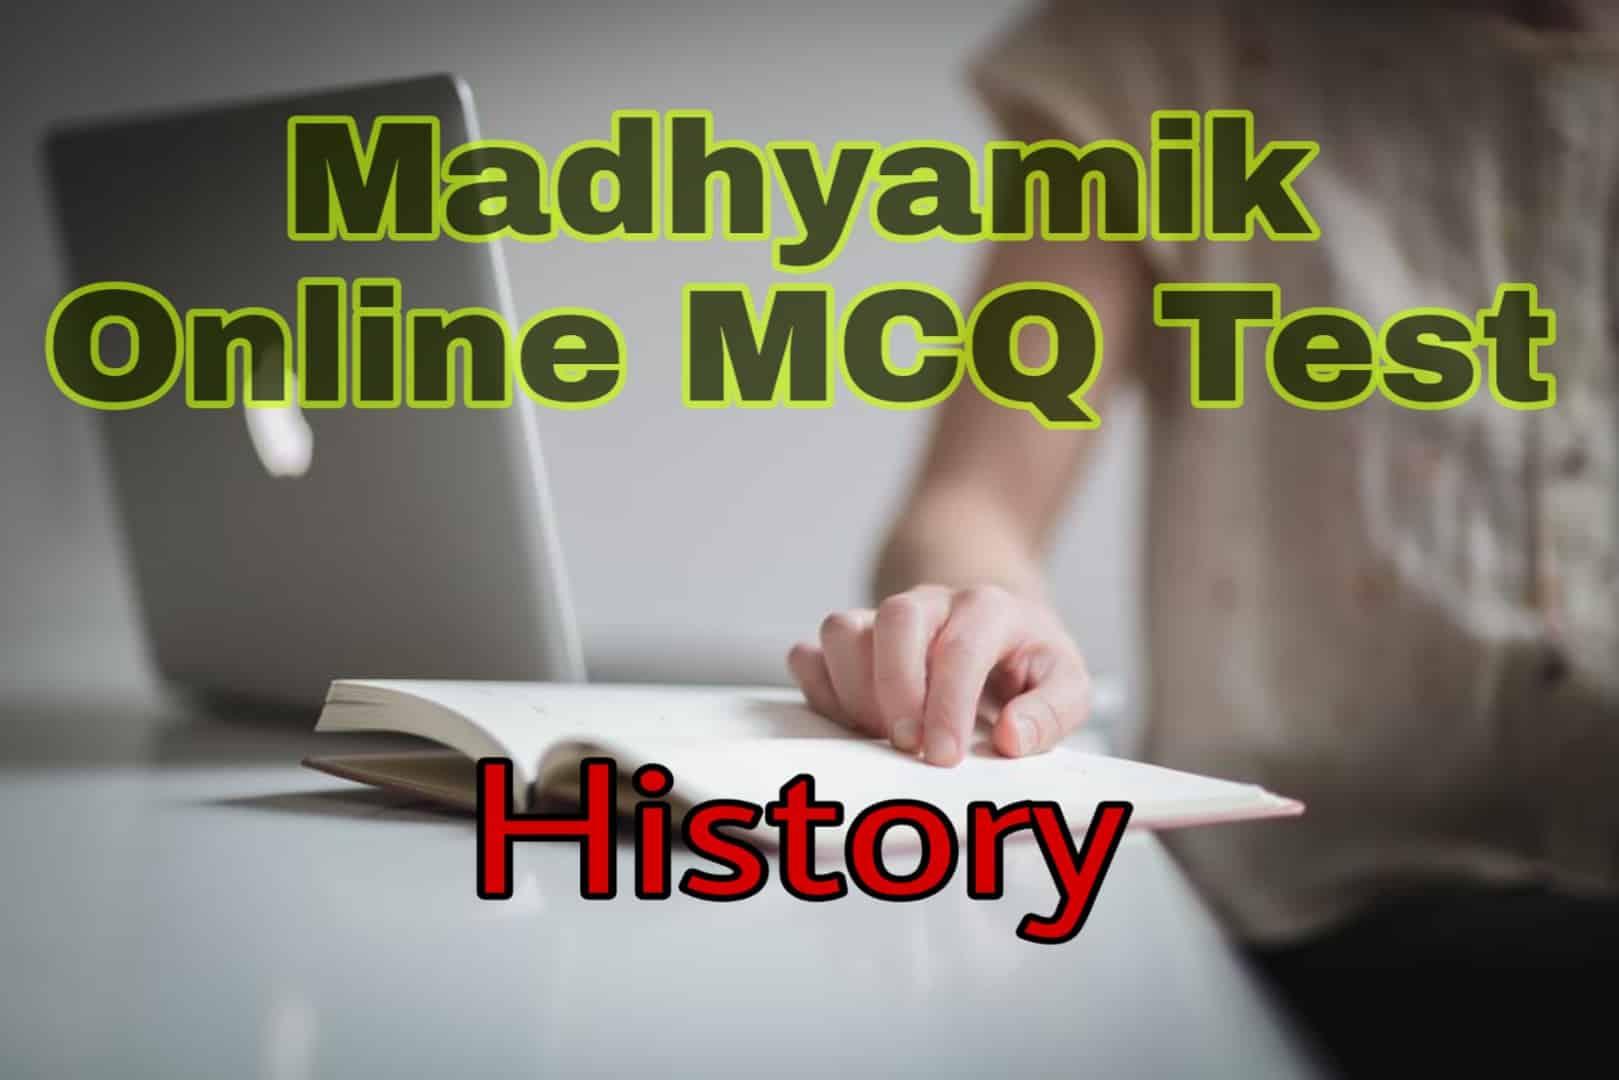 Madhyamik History MCQ questions